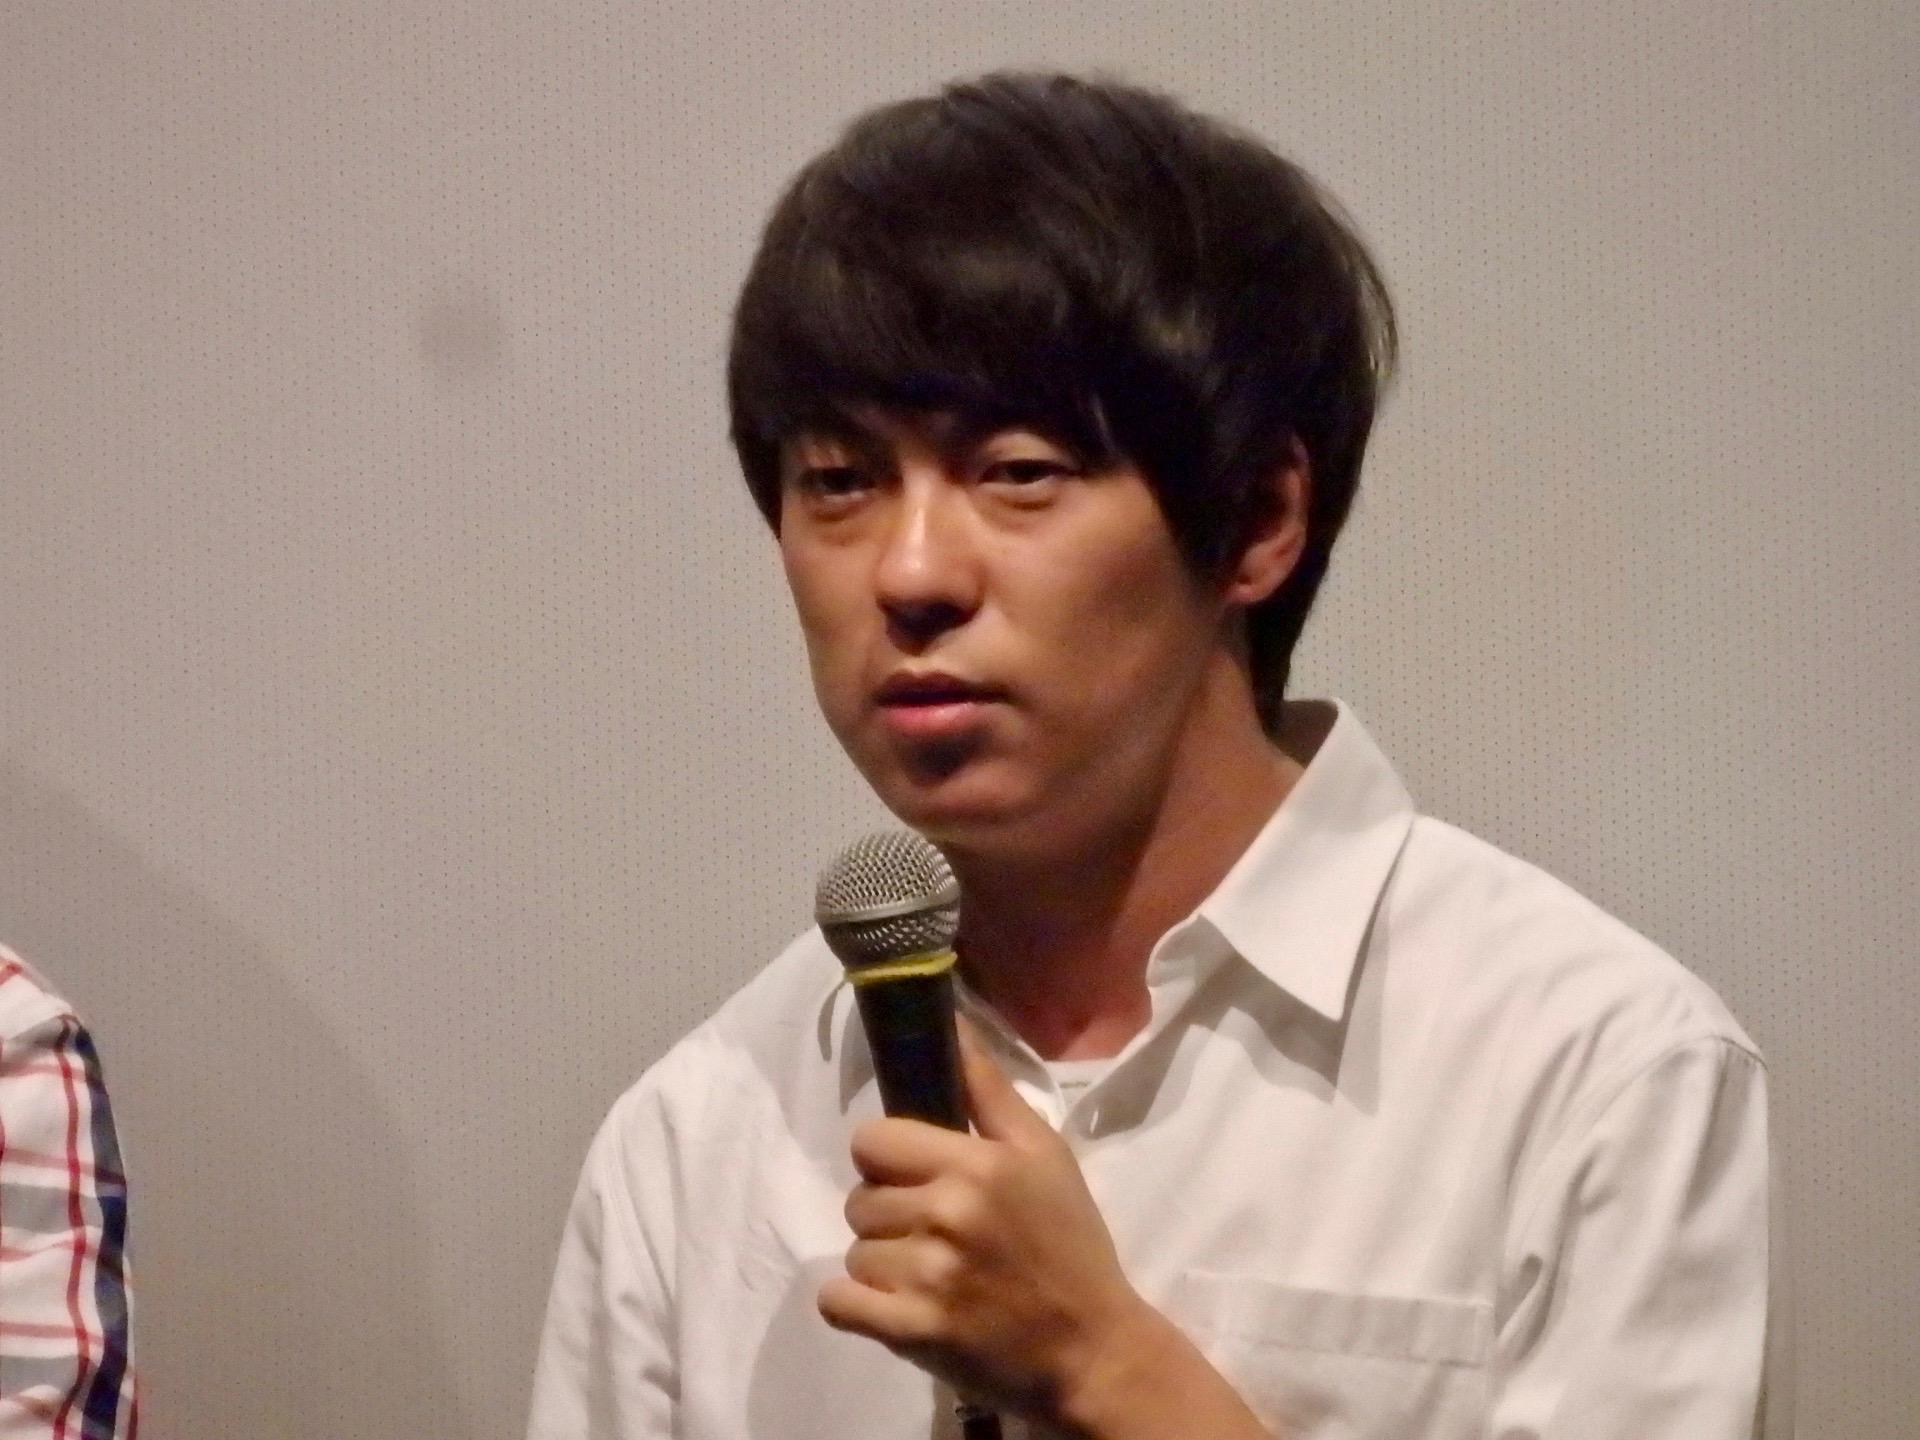 http://news.yoshimoto.co.jp/20171006133606-170c2f3f9b9c00a123bf4b80b387a08e970aedb2.jpg